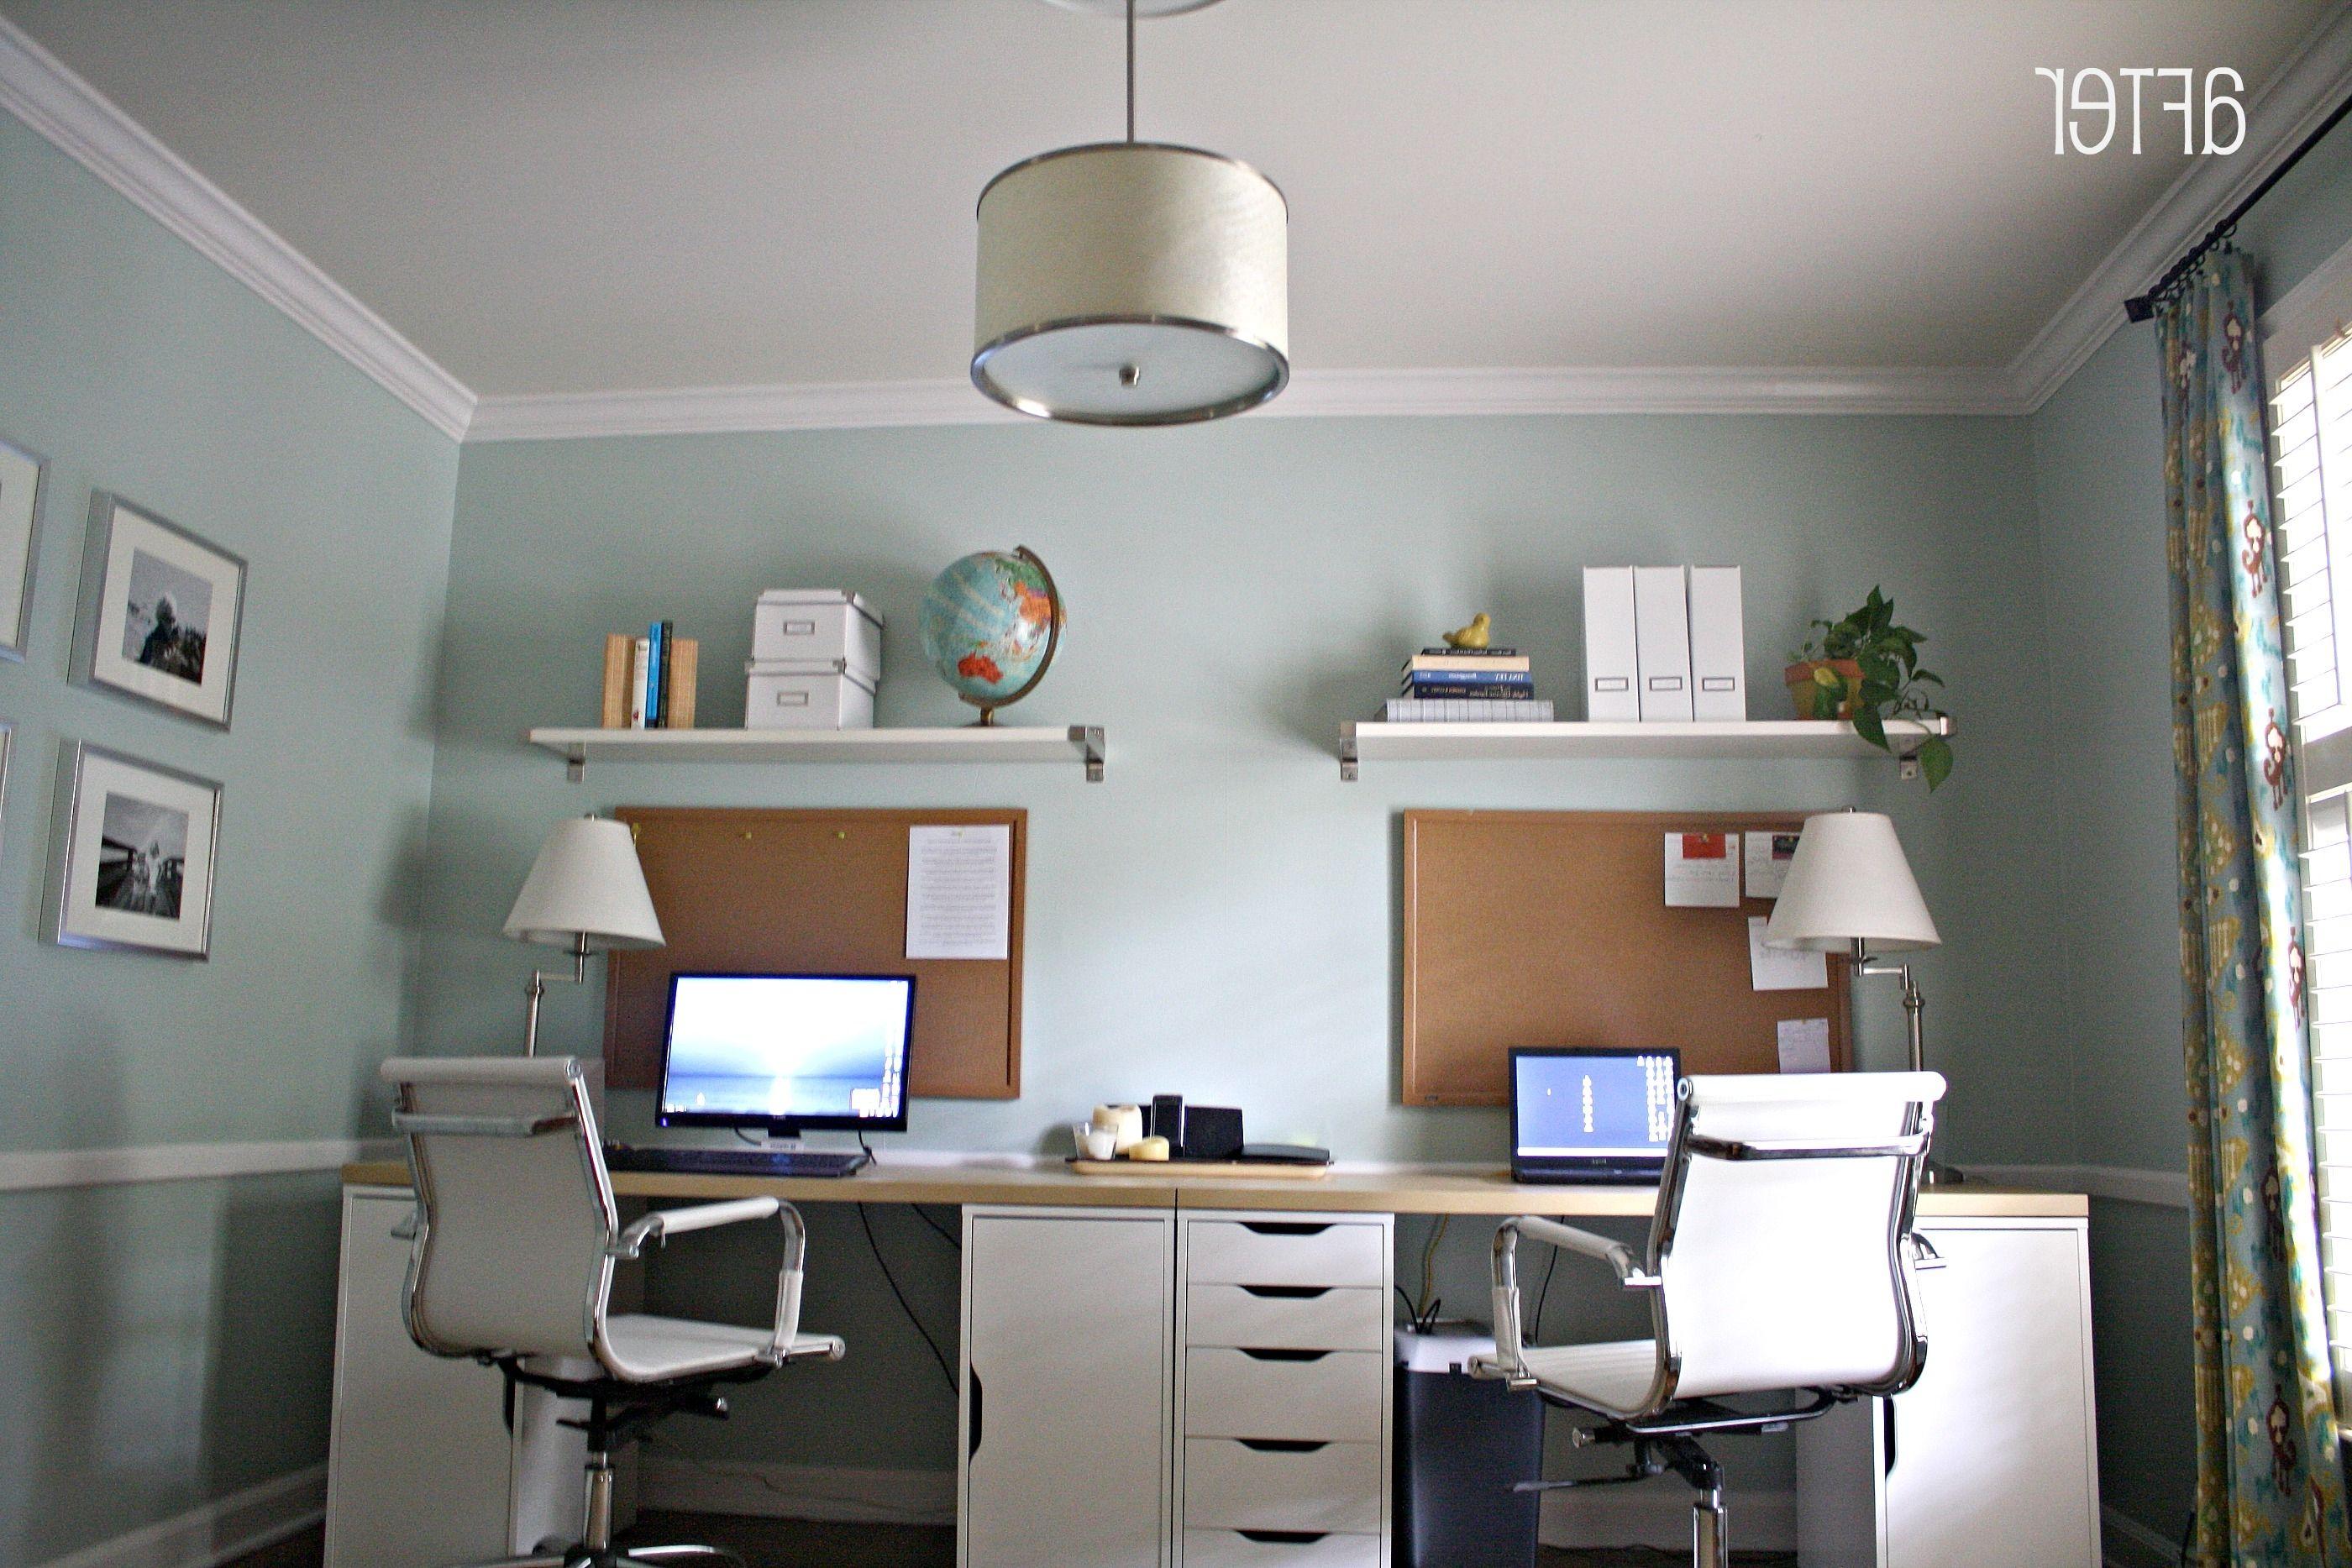 Home Office Home Office Corner Desk 2 Person Home Office Desk